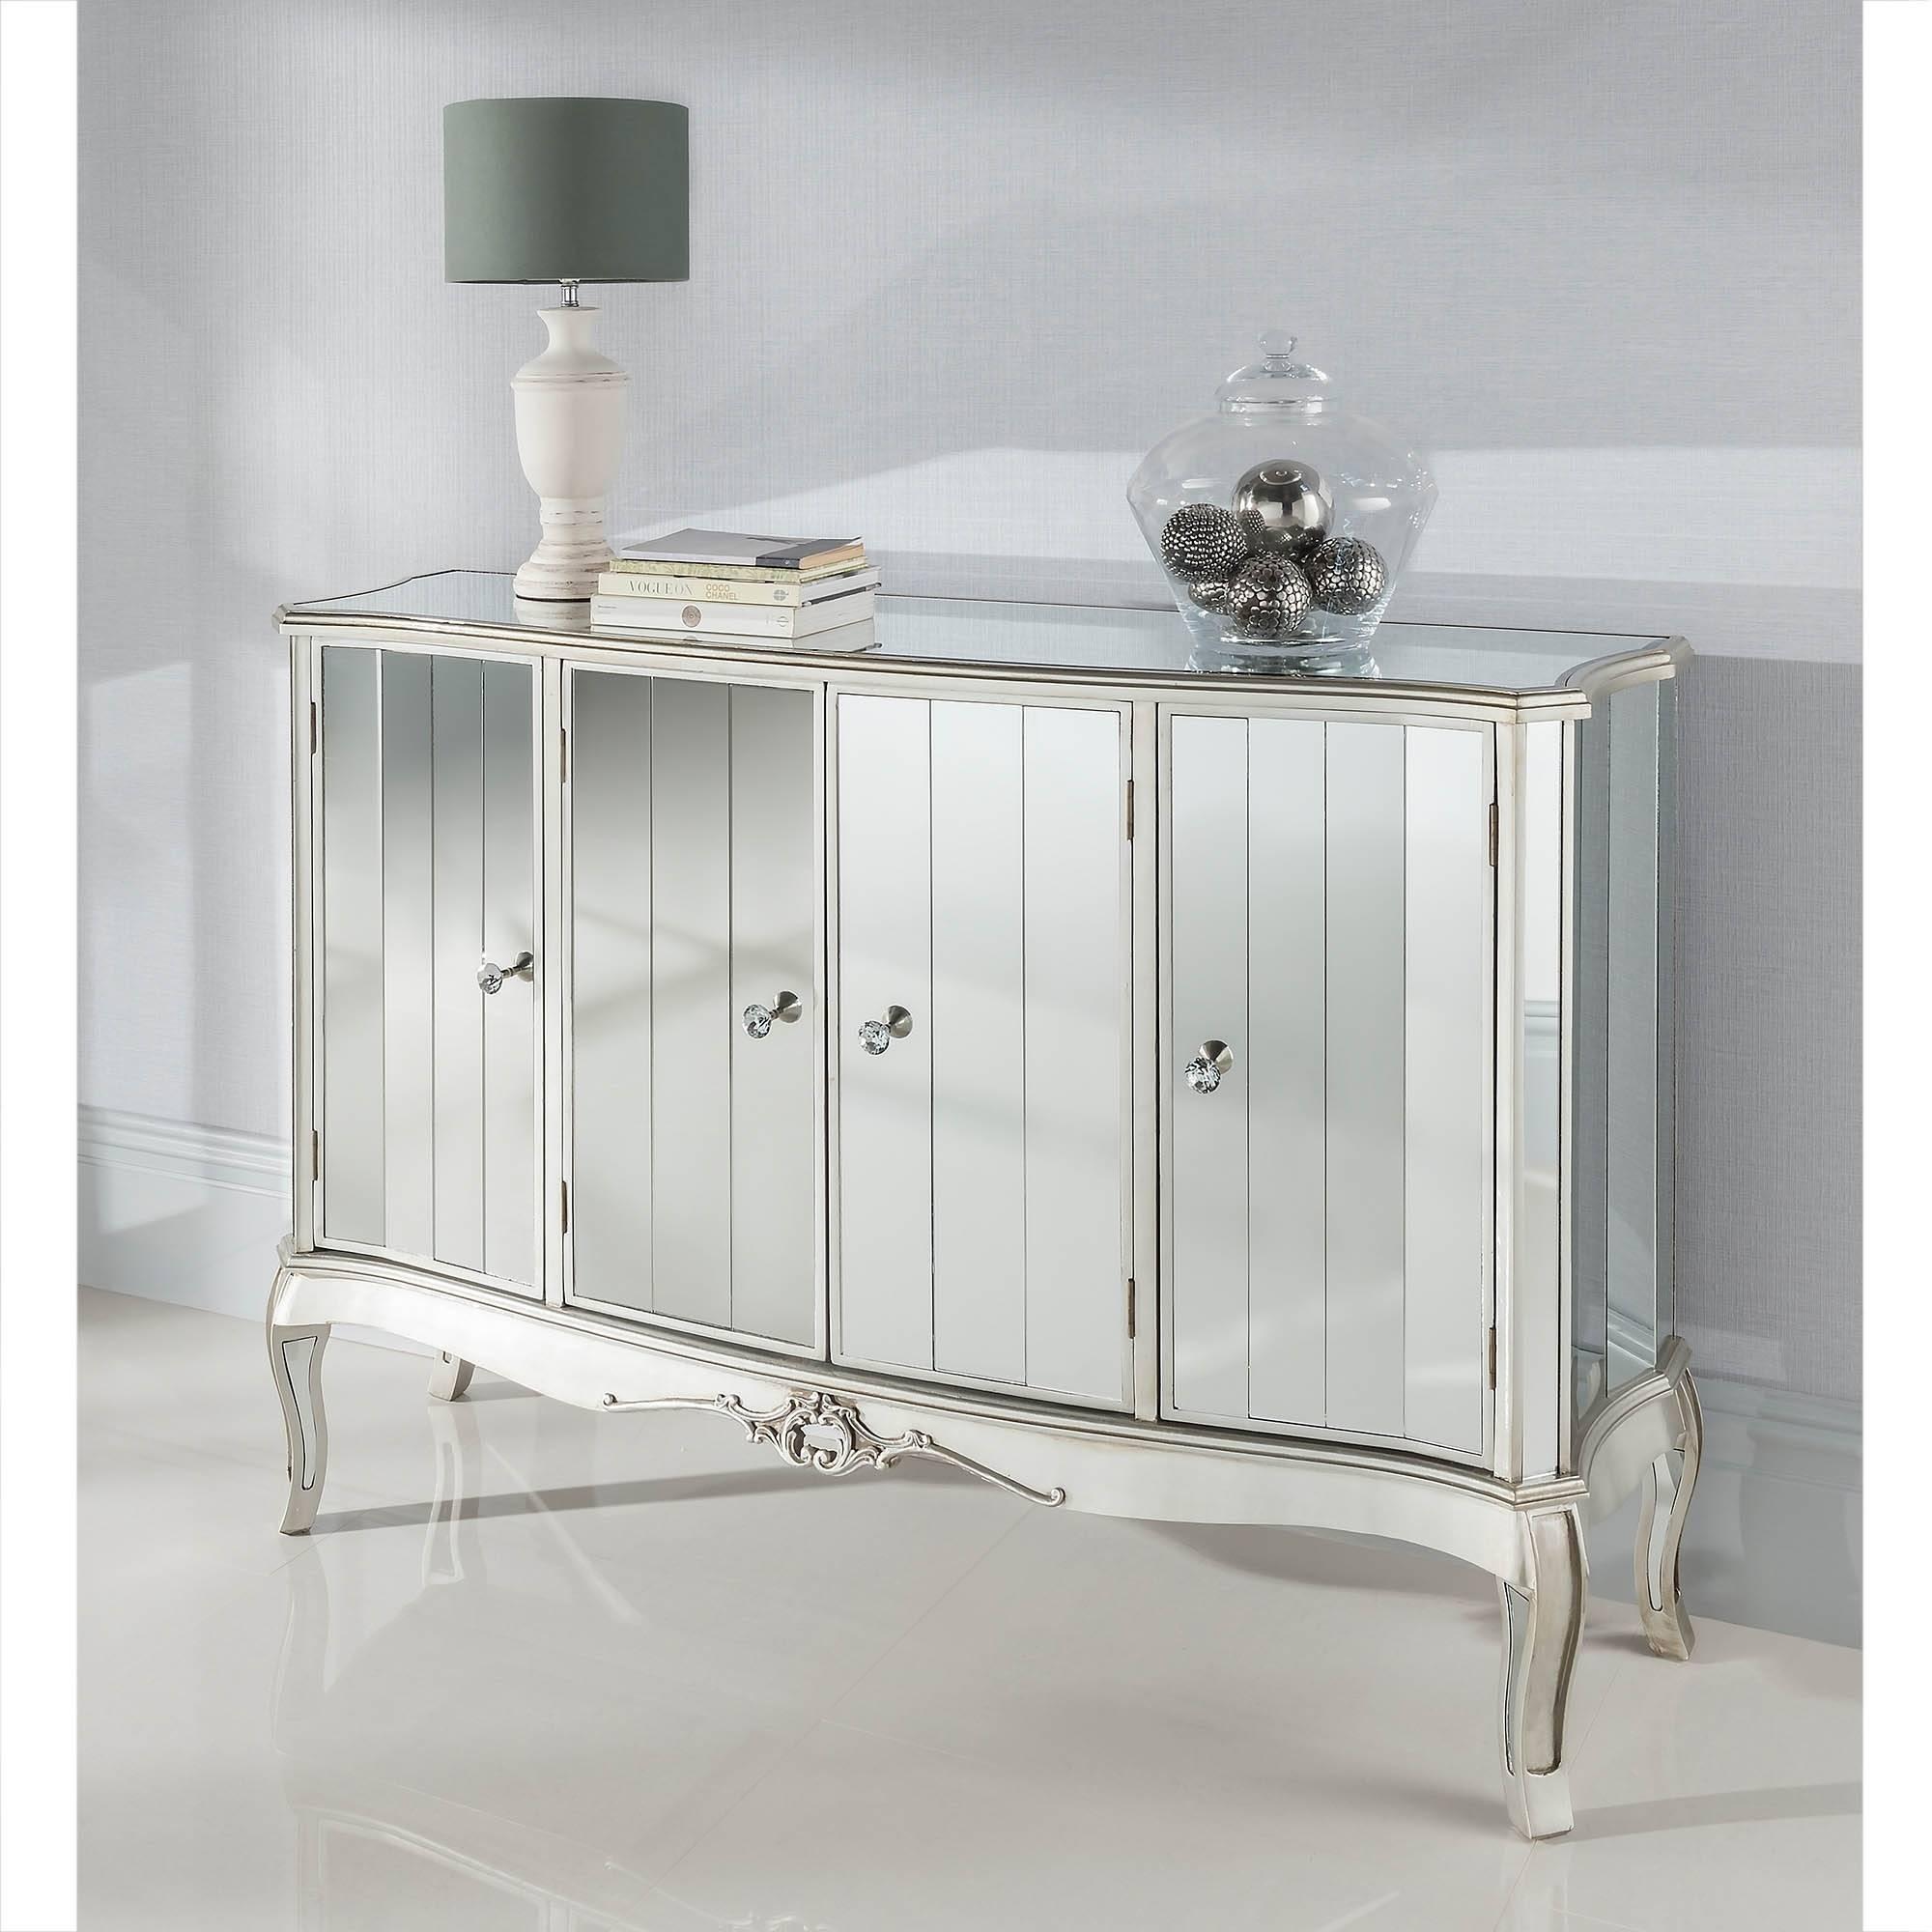 mirror furniture textured vanity glass traditional laminated amazing wood corner cupboard